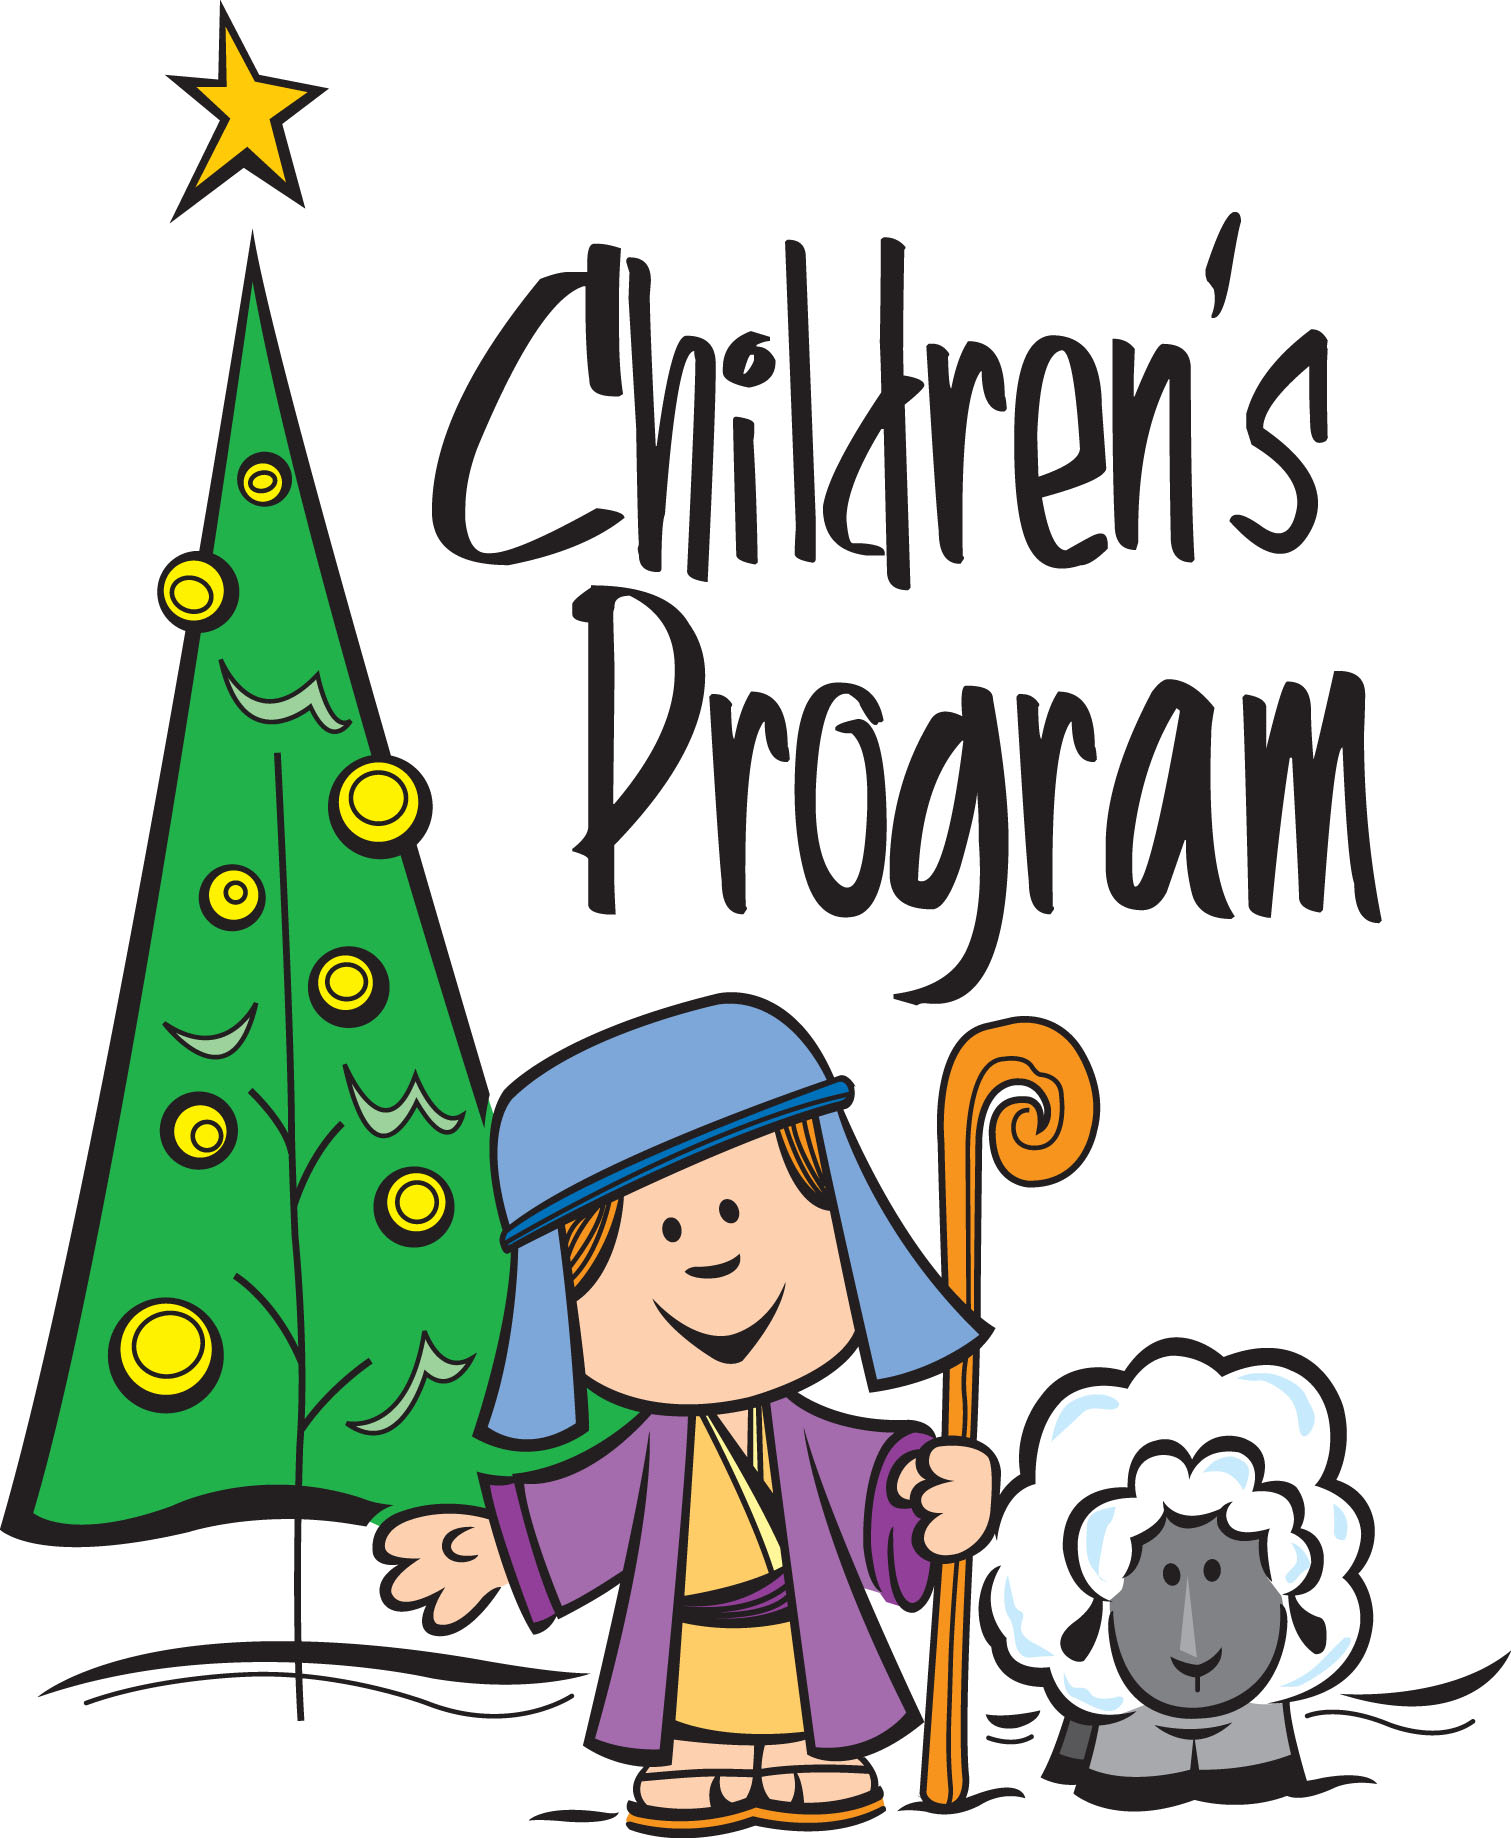 Kindergarten christmas program clipart clipart freeuse Kindergarten christmas program clipart - ClipartFest clipart freeuse